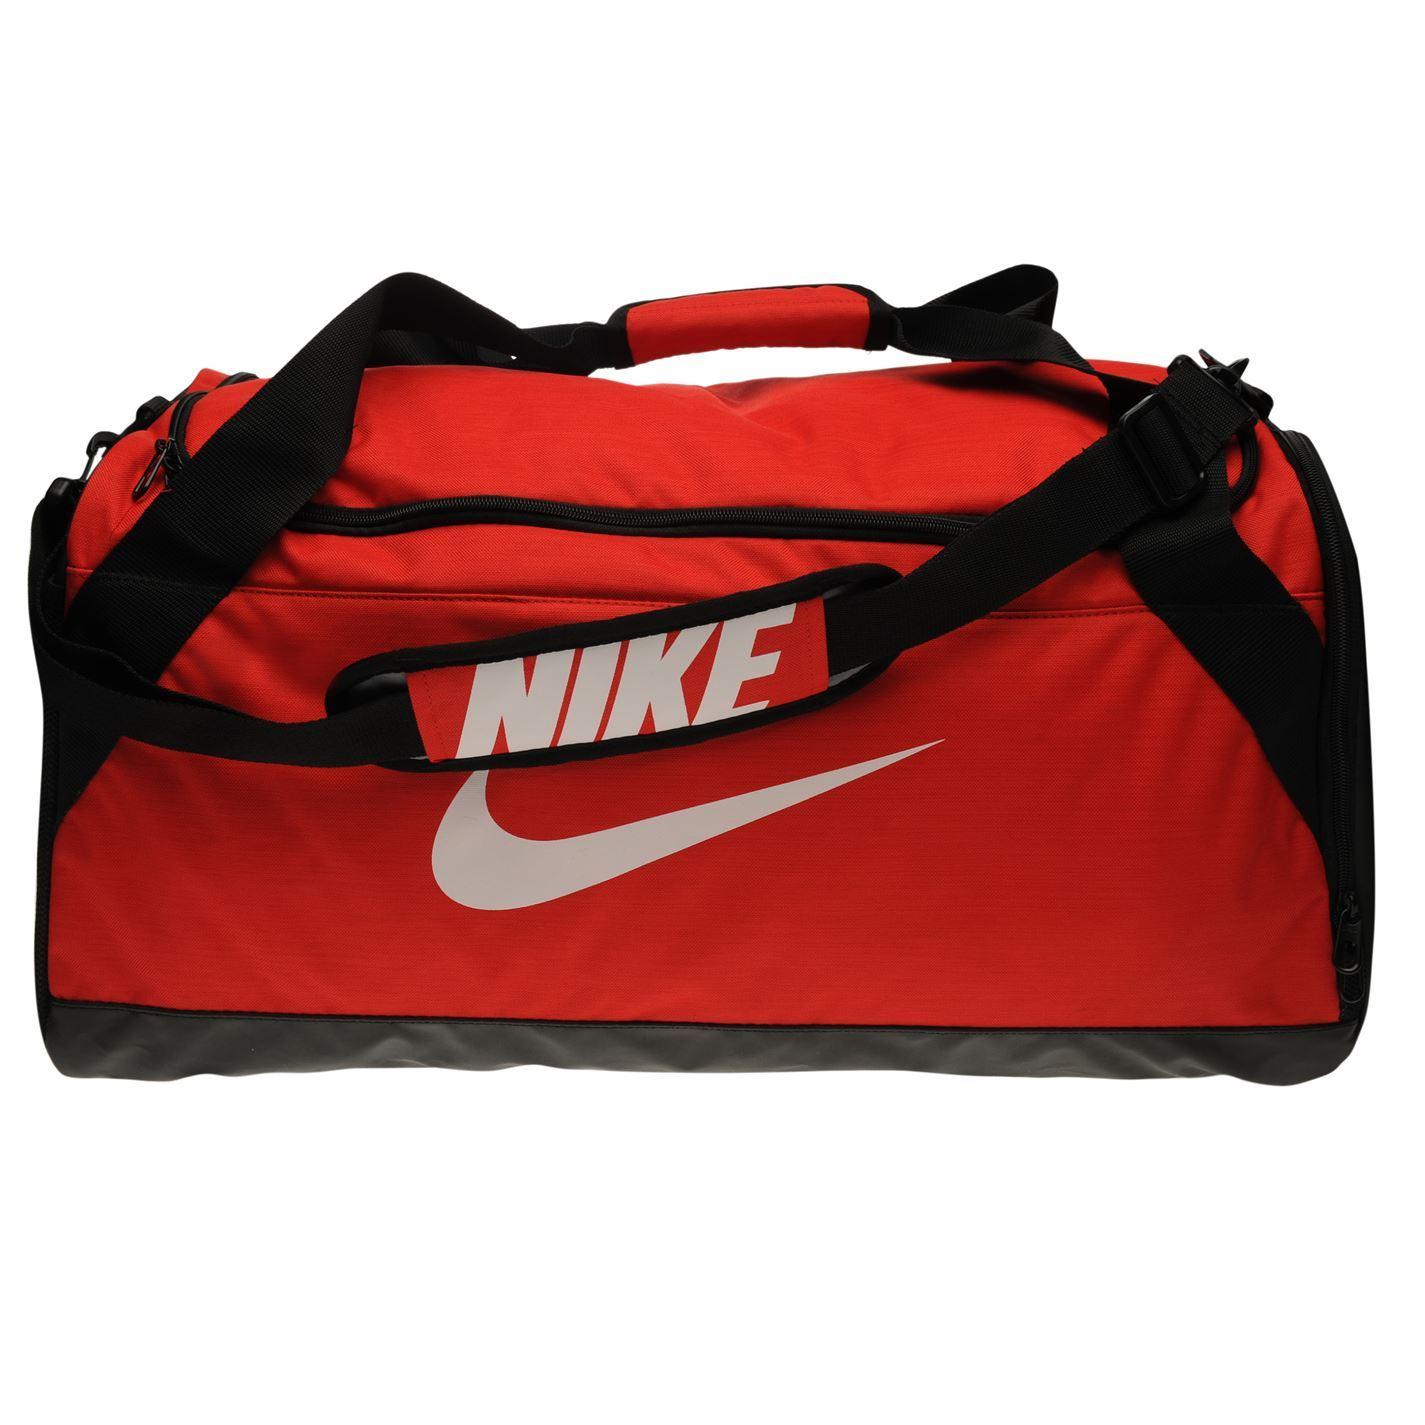 bd4bb77e8989 ... Nike Brasilia Medium Sports Holdall Red Gym Kit Bag Carryall ...